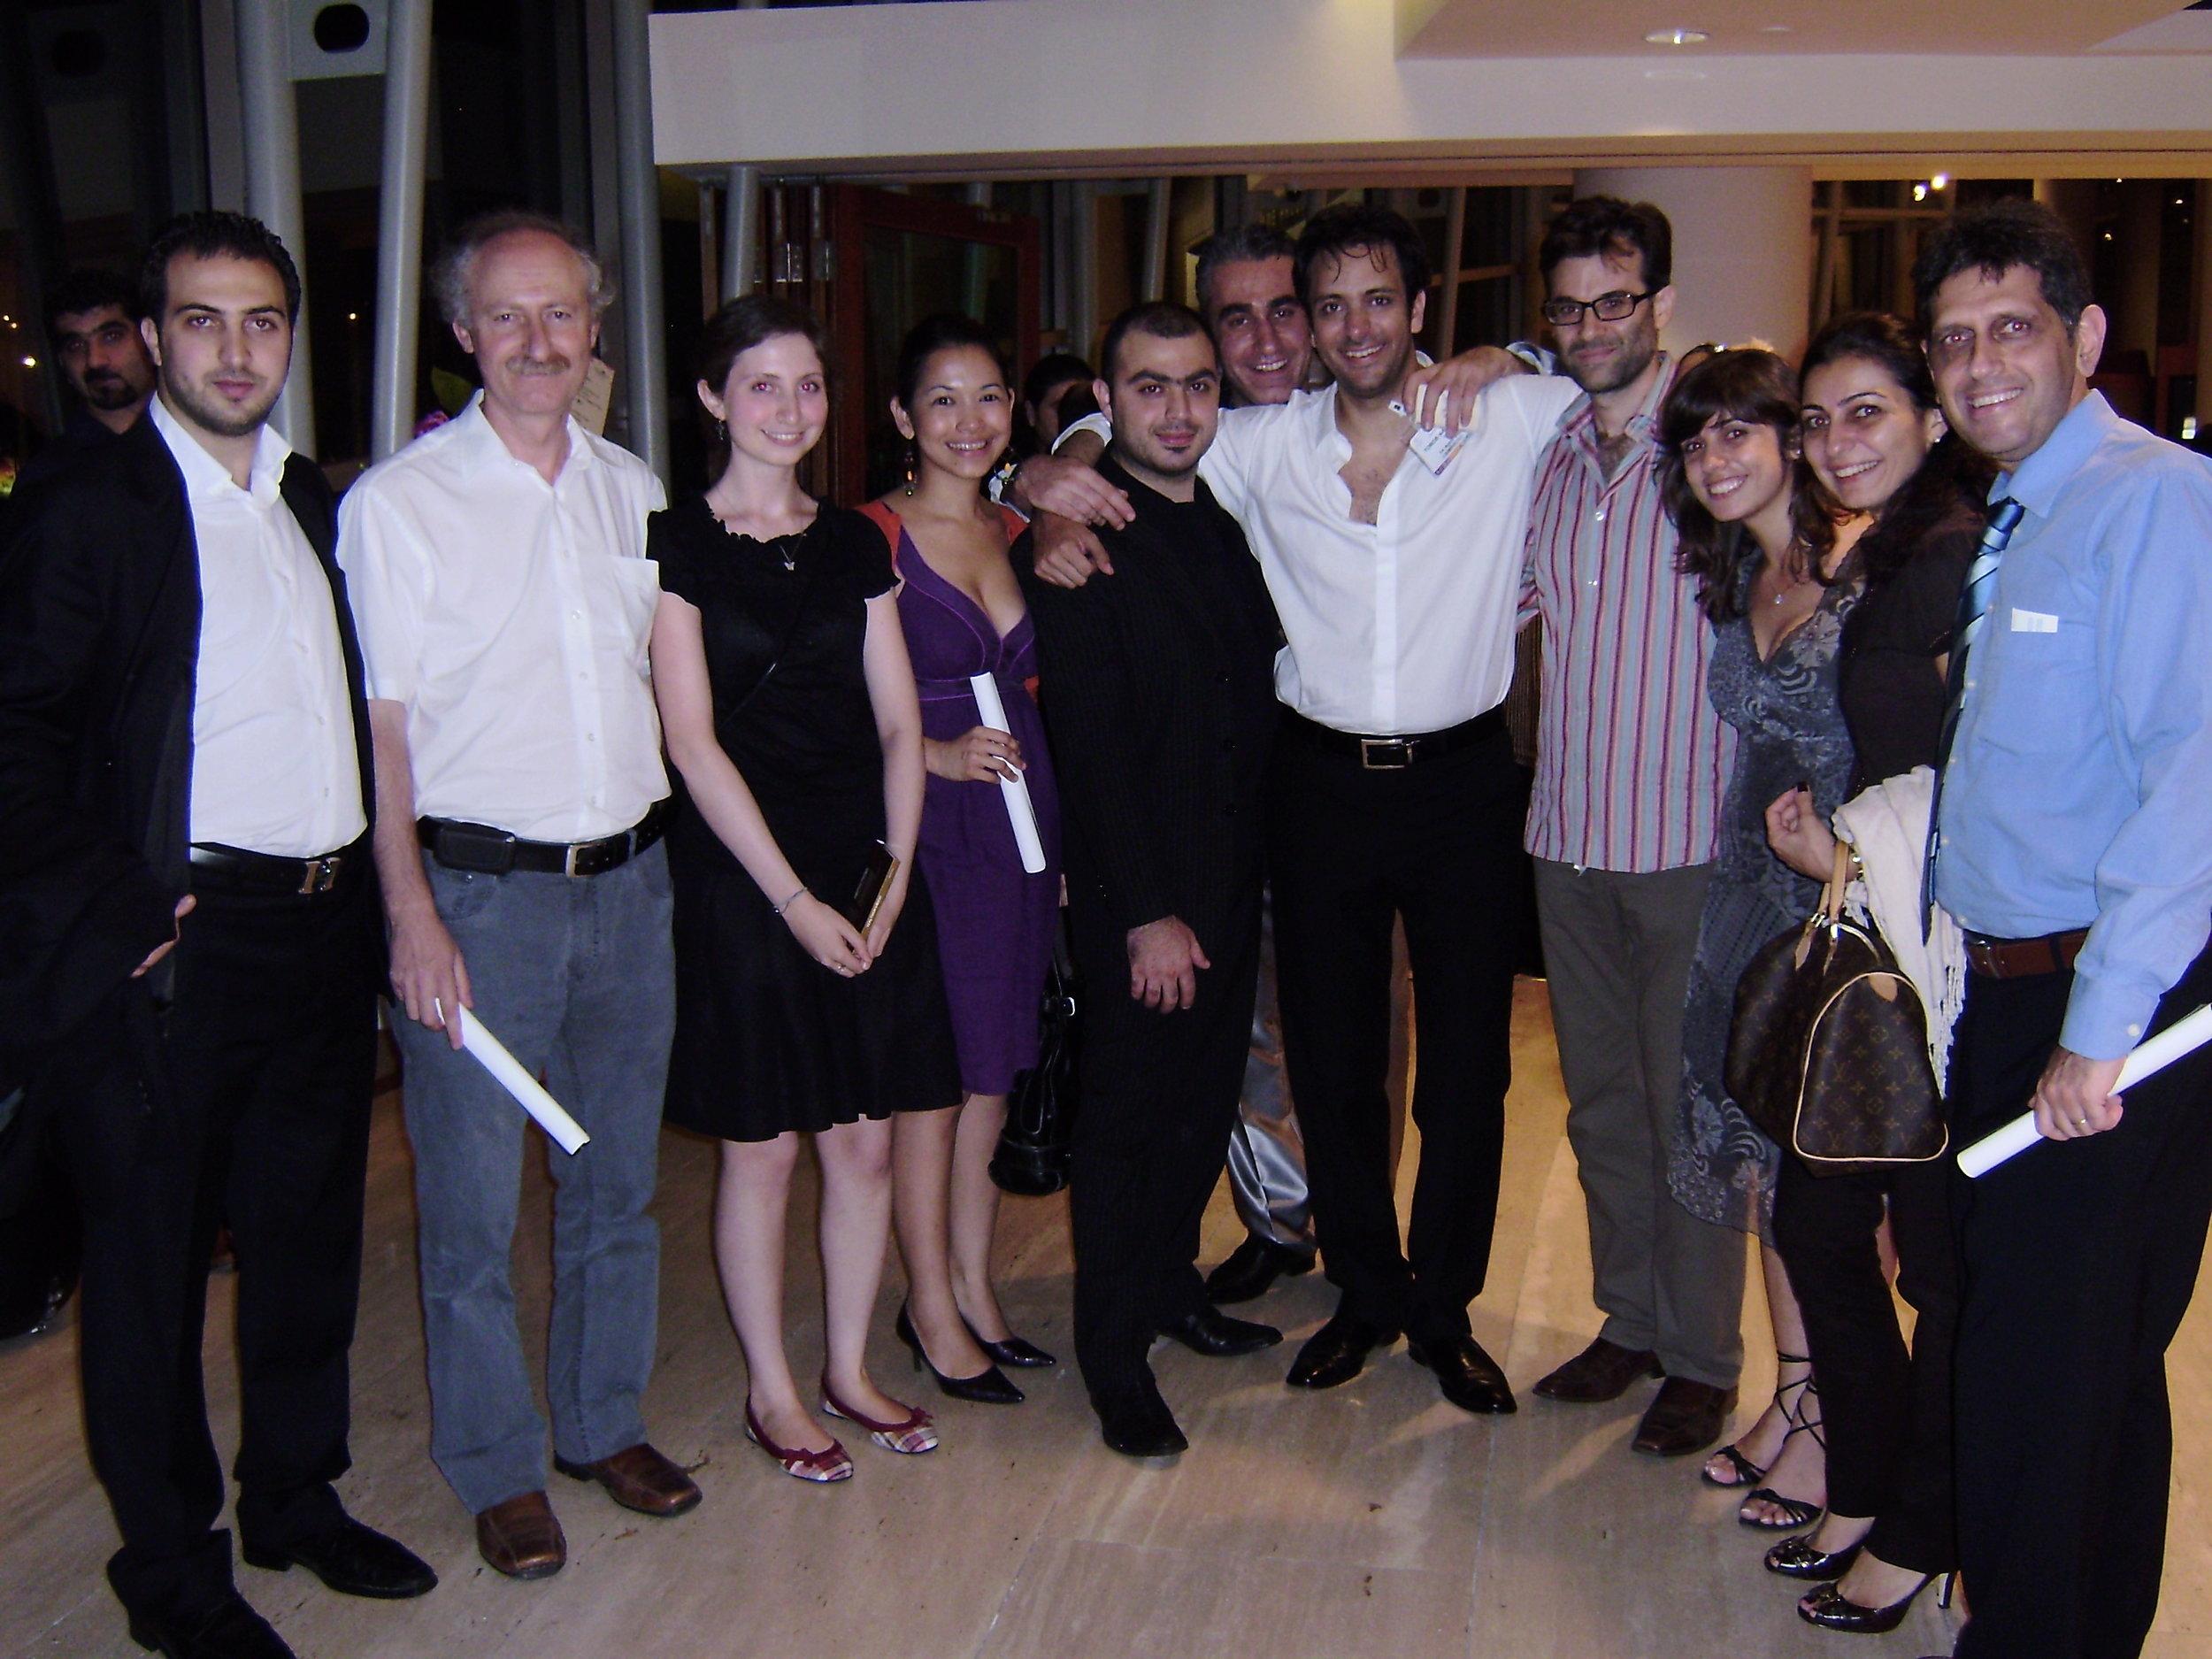 2009-07-09-guy-manoukian-singapore.jpg